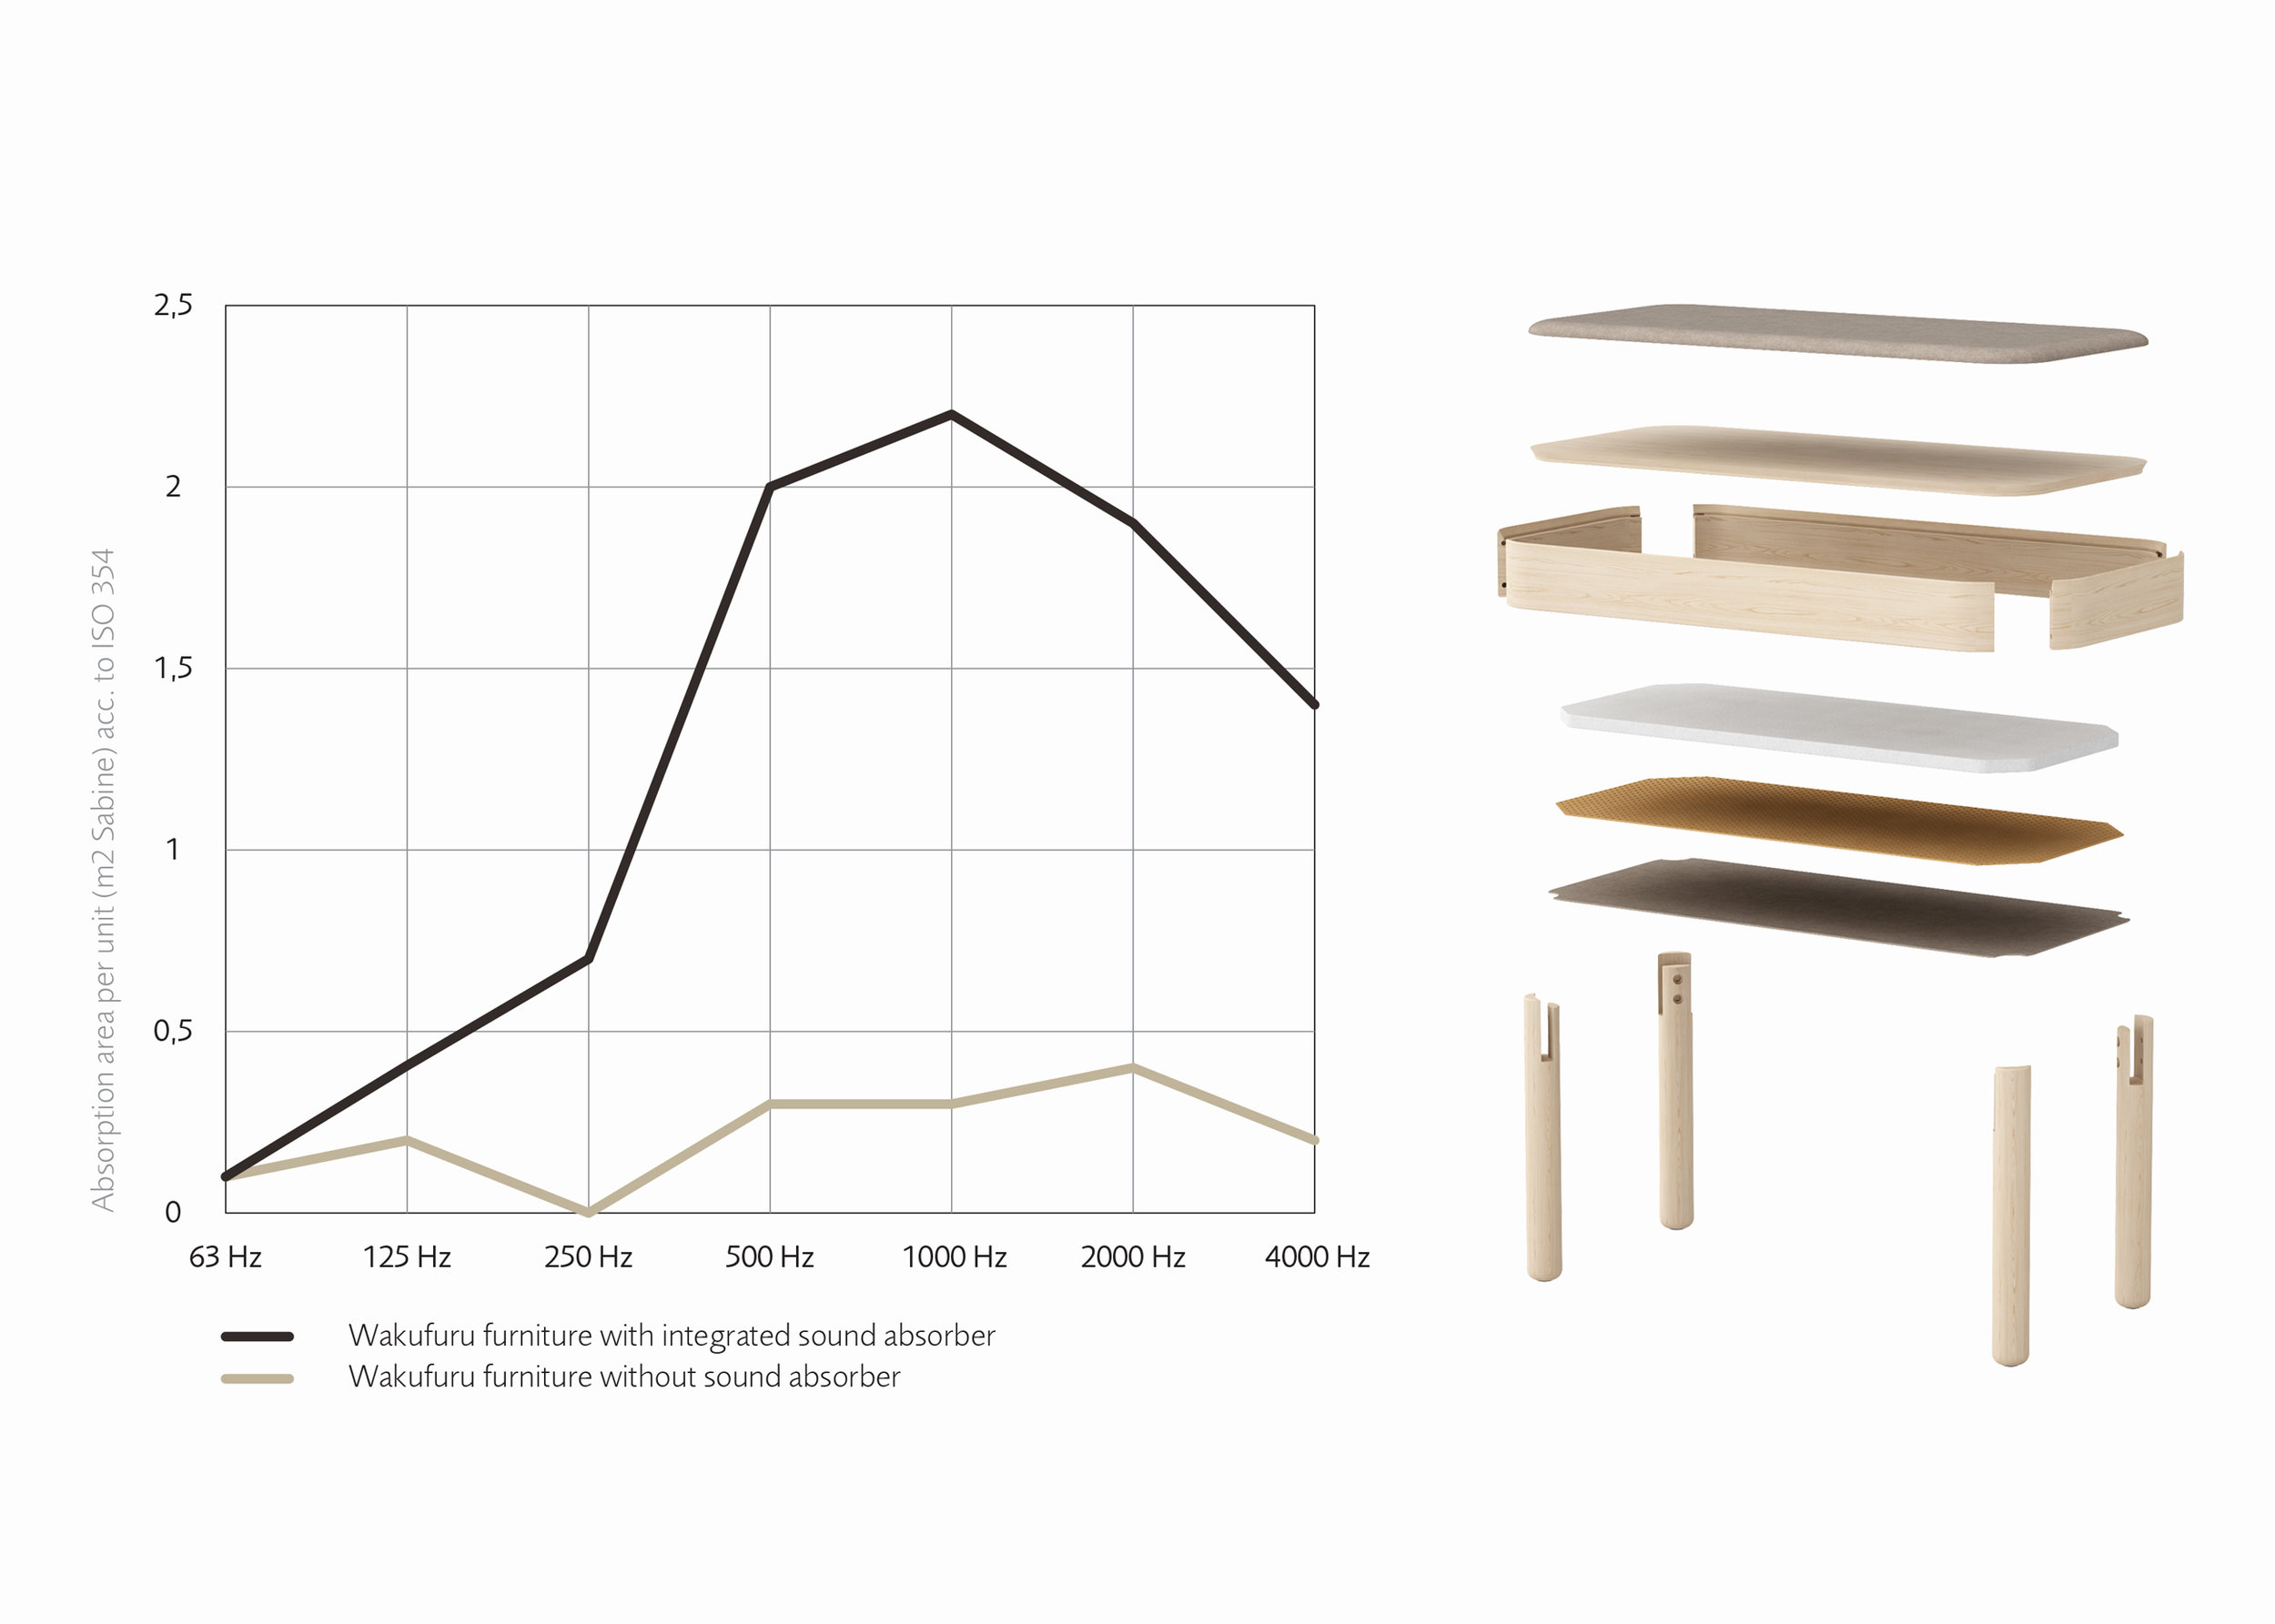 Wakufuru furniture by Glimakra of Sweden - Acoustic Test & diagram.